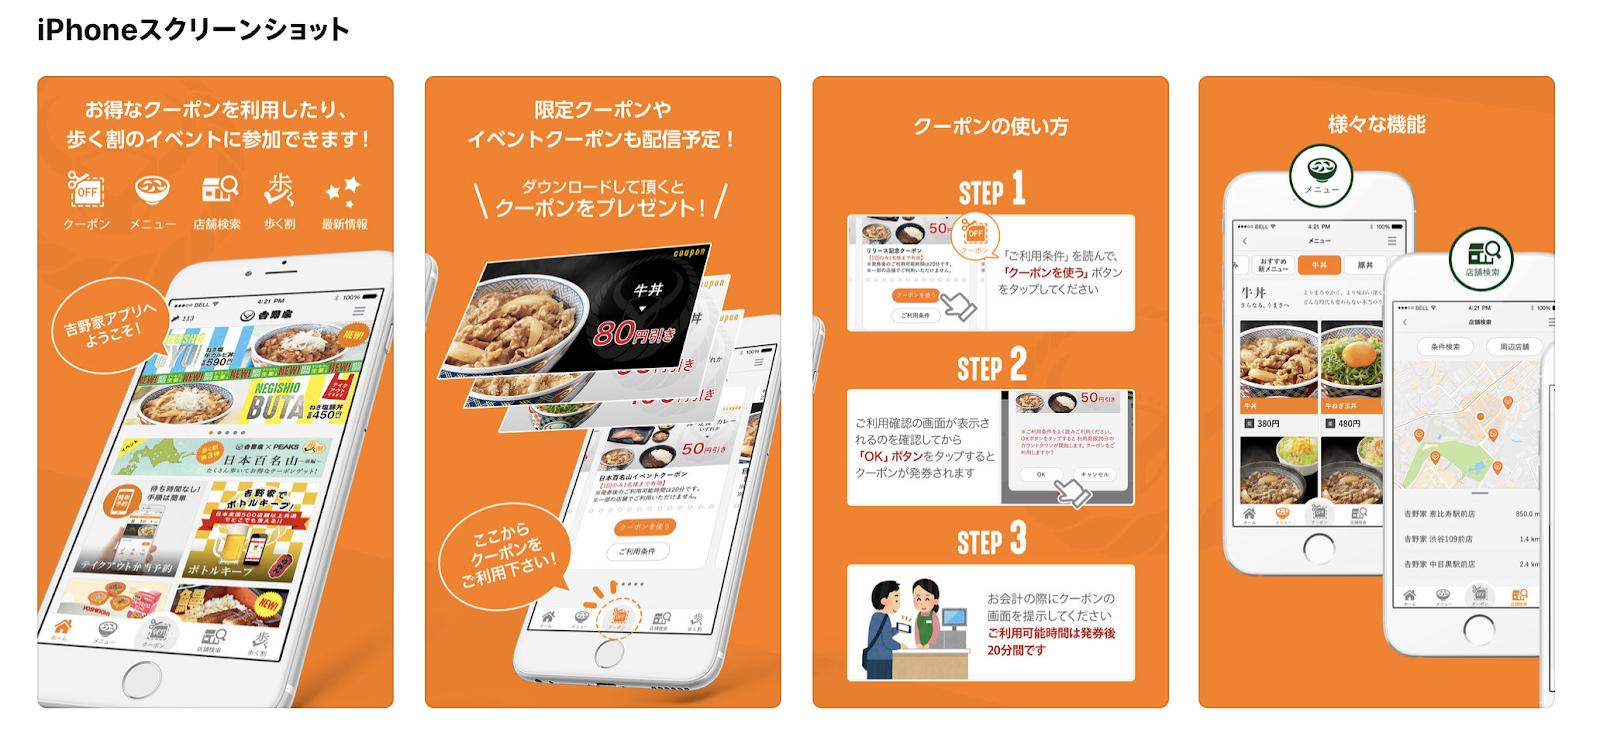 https://itunes.apple.com/jp/app/吉野家公式アプリ-スマホ歩数計連動型クーポンアプリ/id1131084339?mt=8